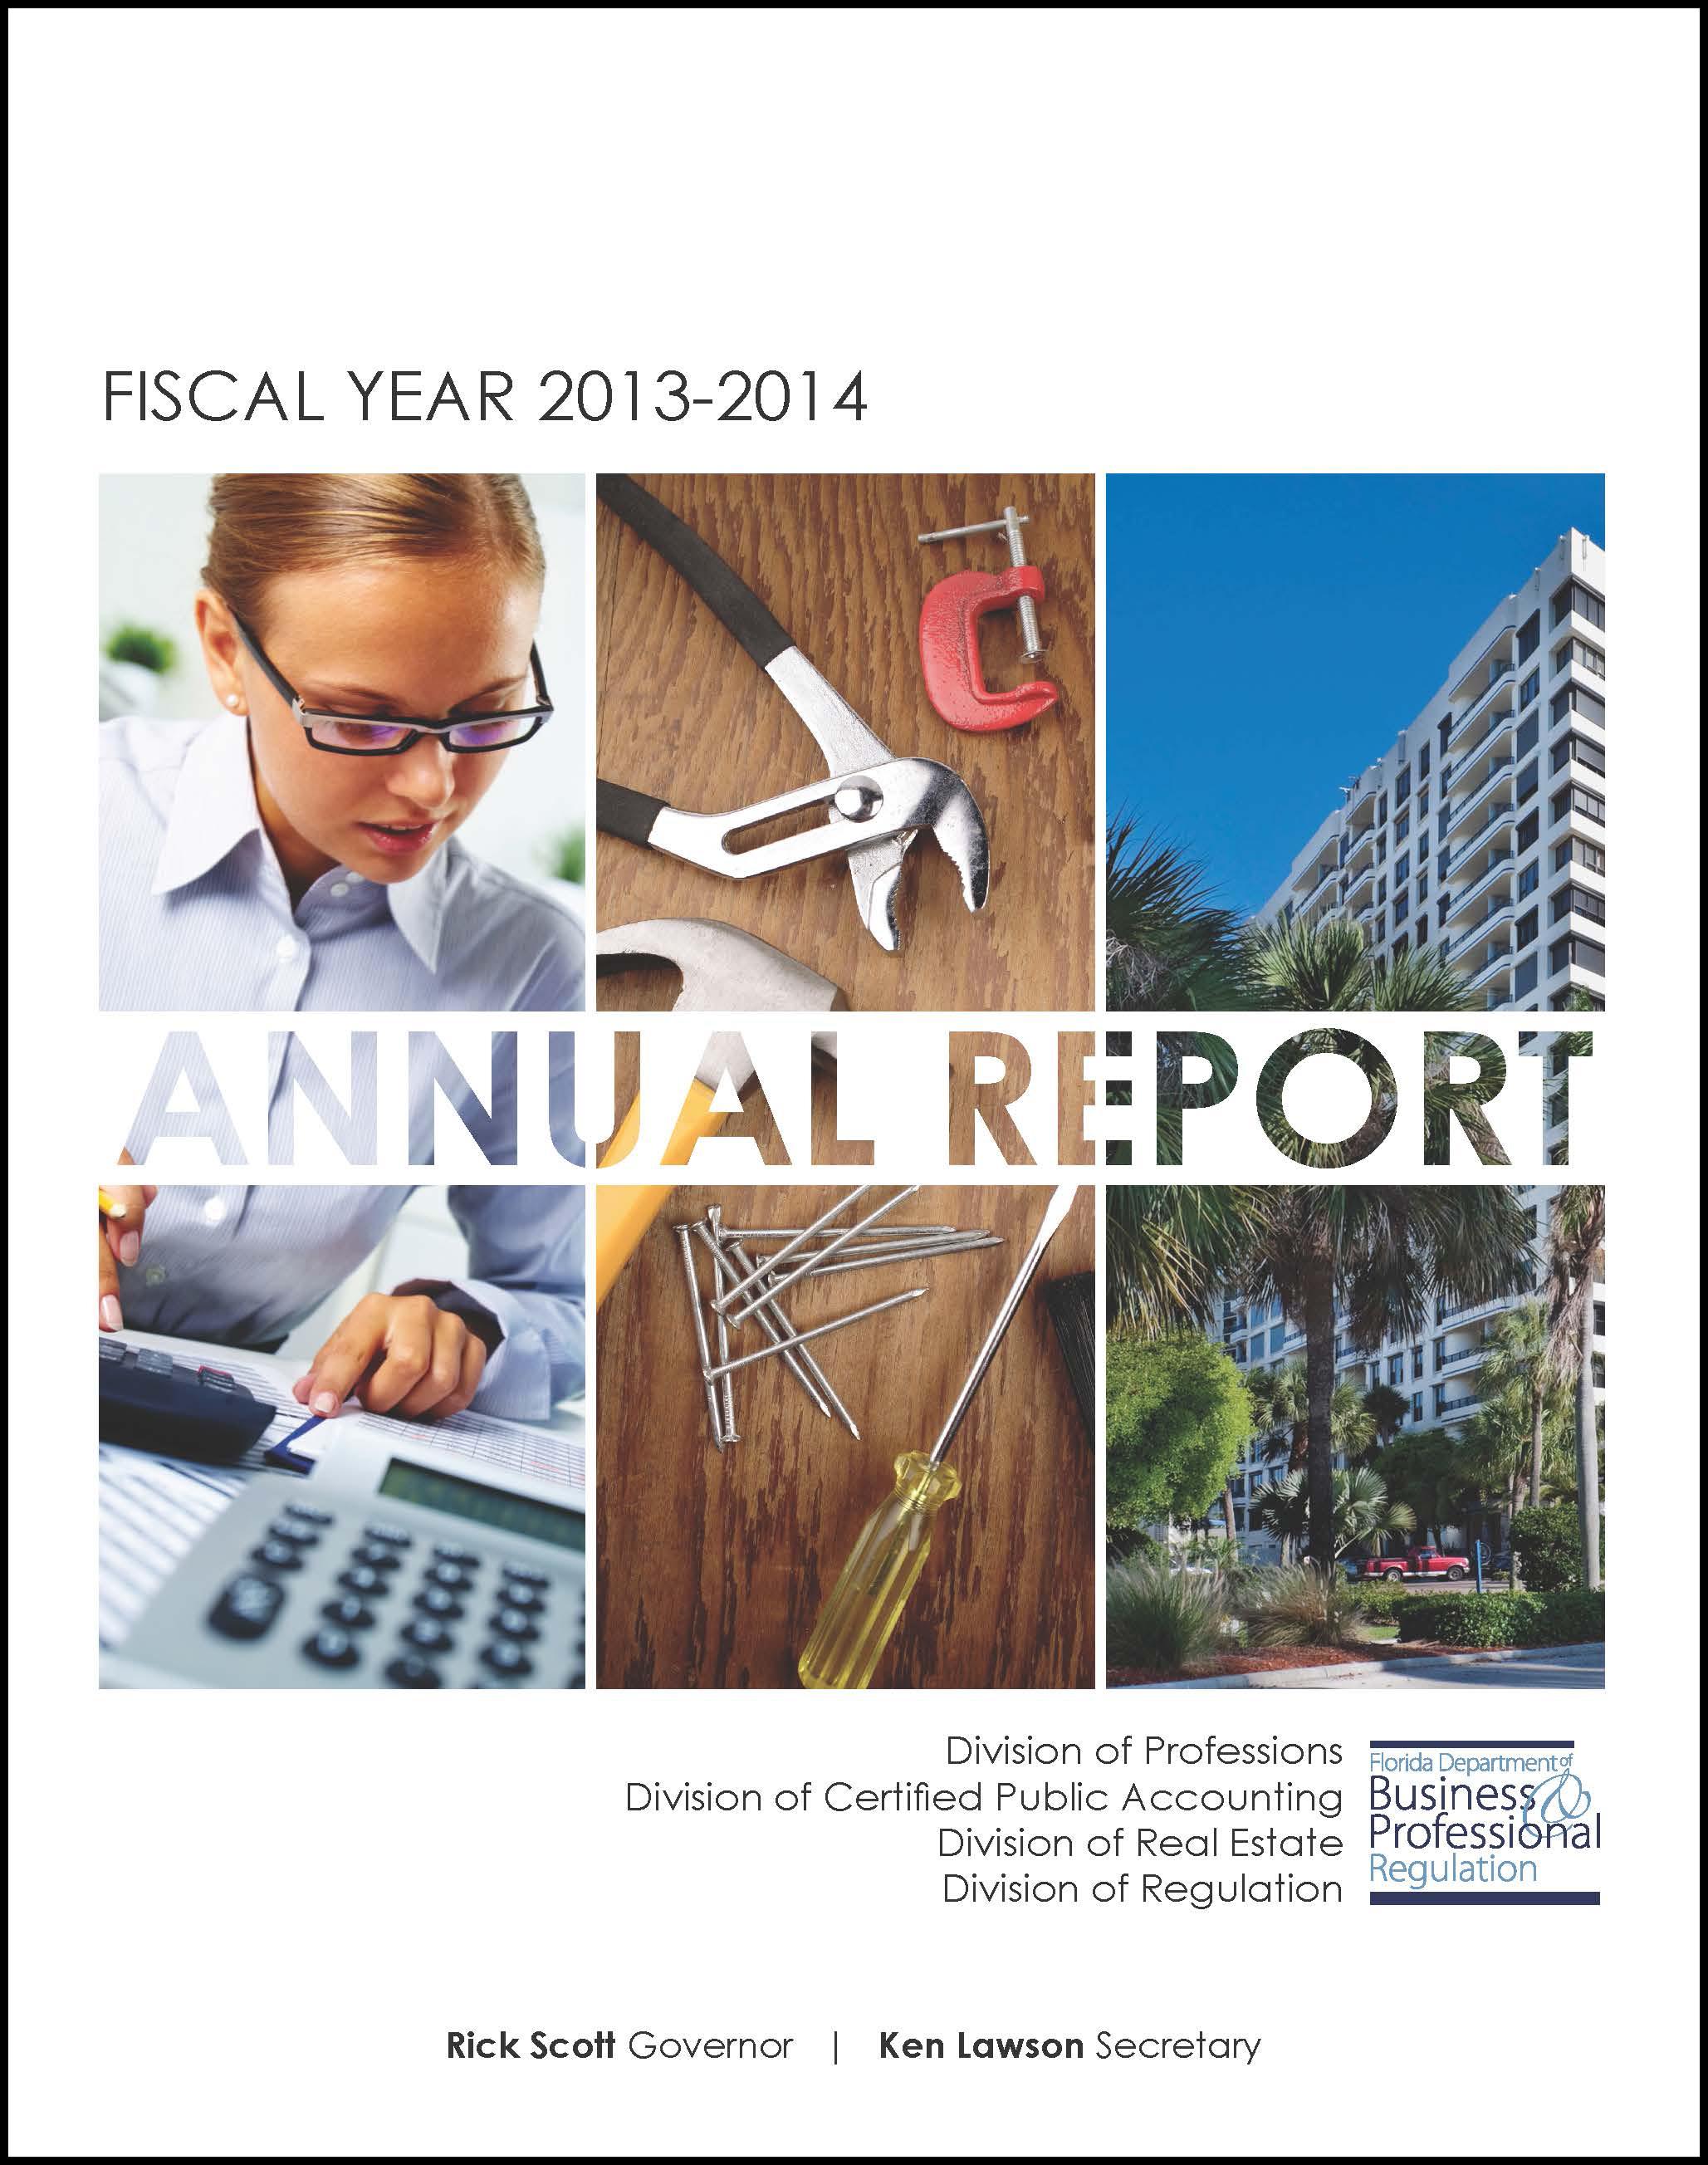 PRO-CPA-DRE-REG Annual Report 13-14 Cover.jpg